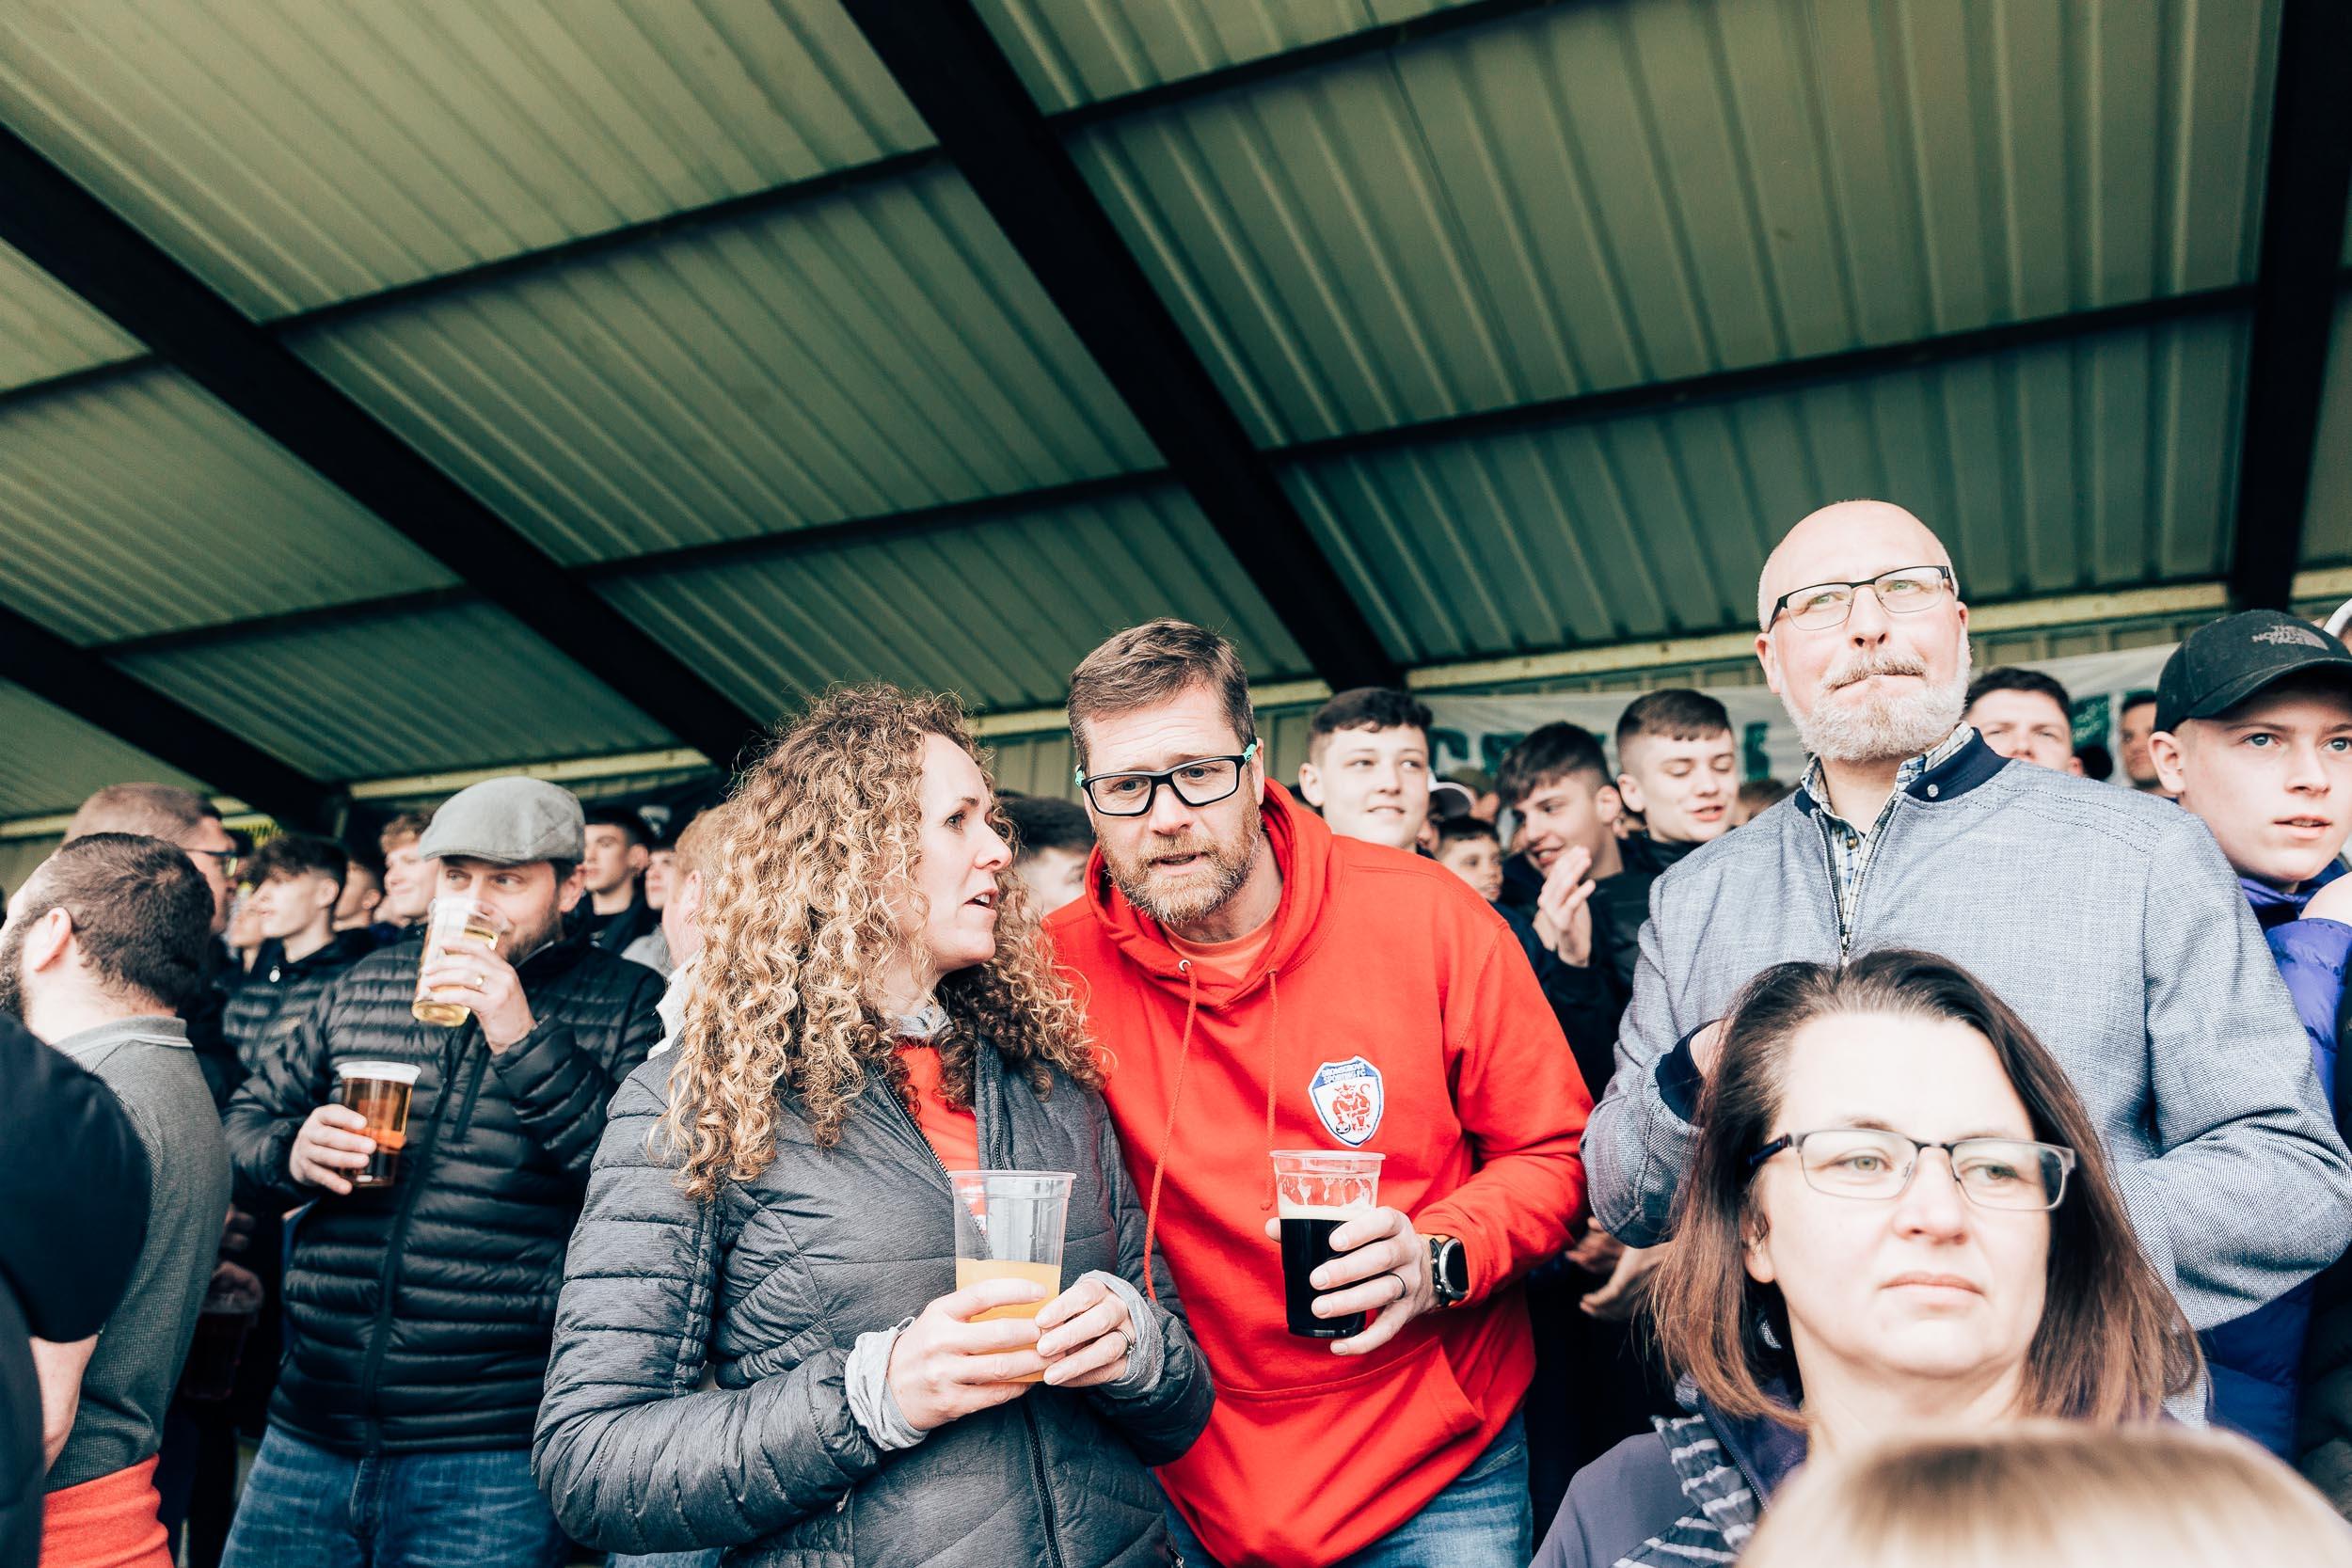 06_05_2019_Bromsgrove_Sporting_Corby-37.jpg